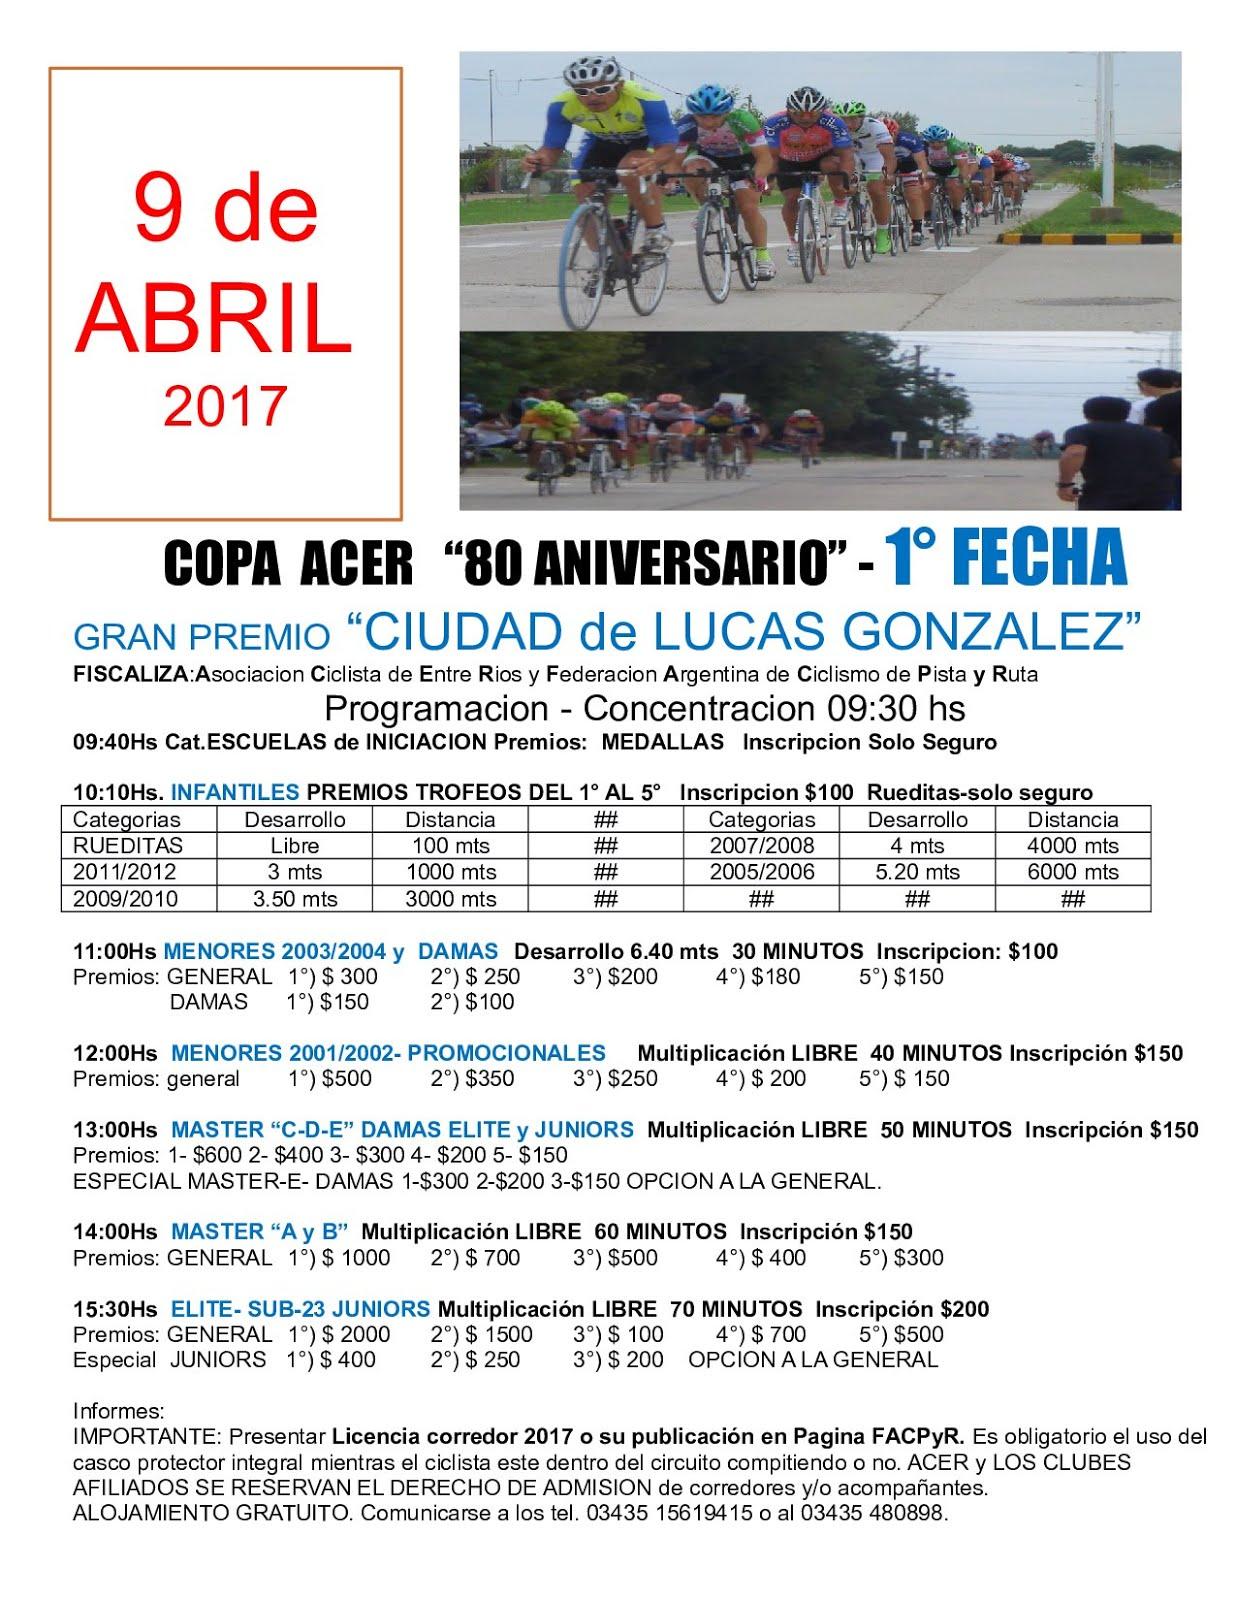 Copa Entre Rios - 1 Fecha